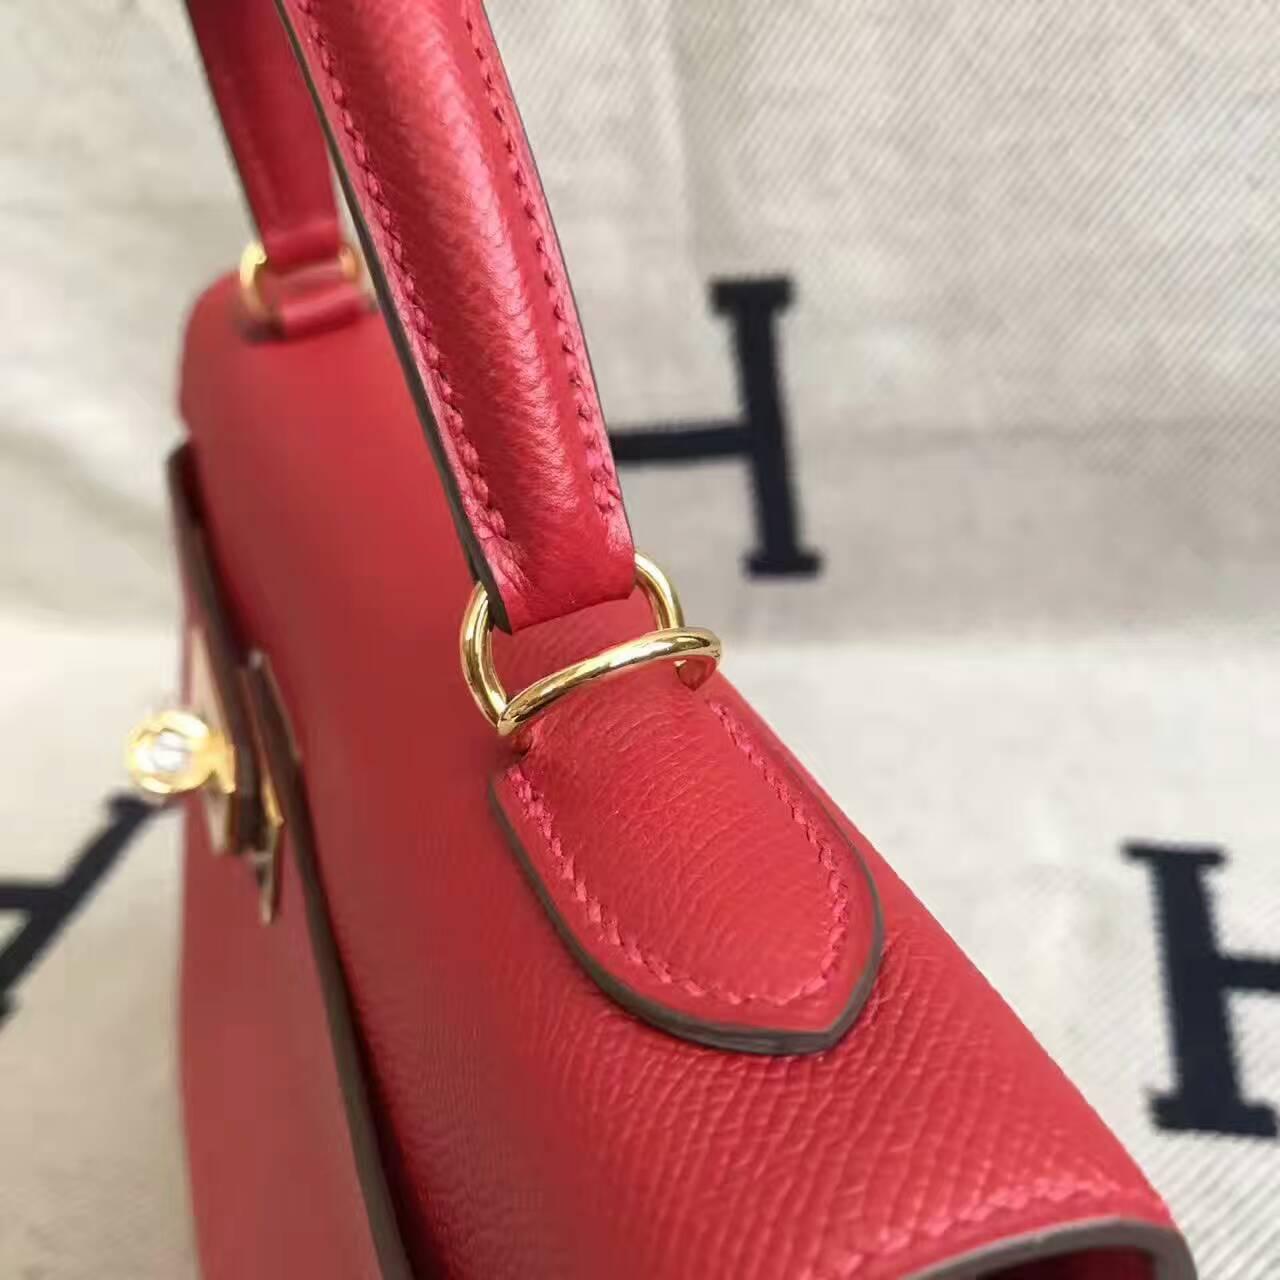 Discount Hermes Q5 Rouge Casaque Epsom Leather Kelly32CM Handbag